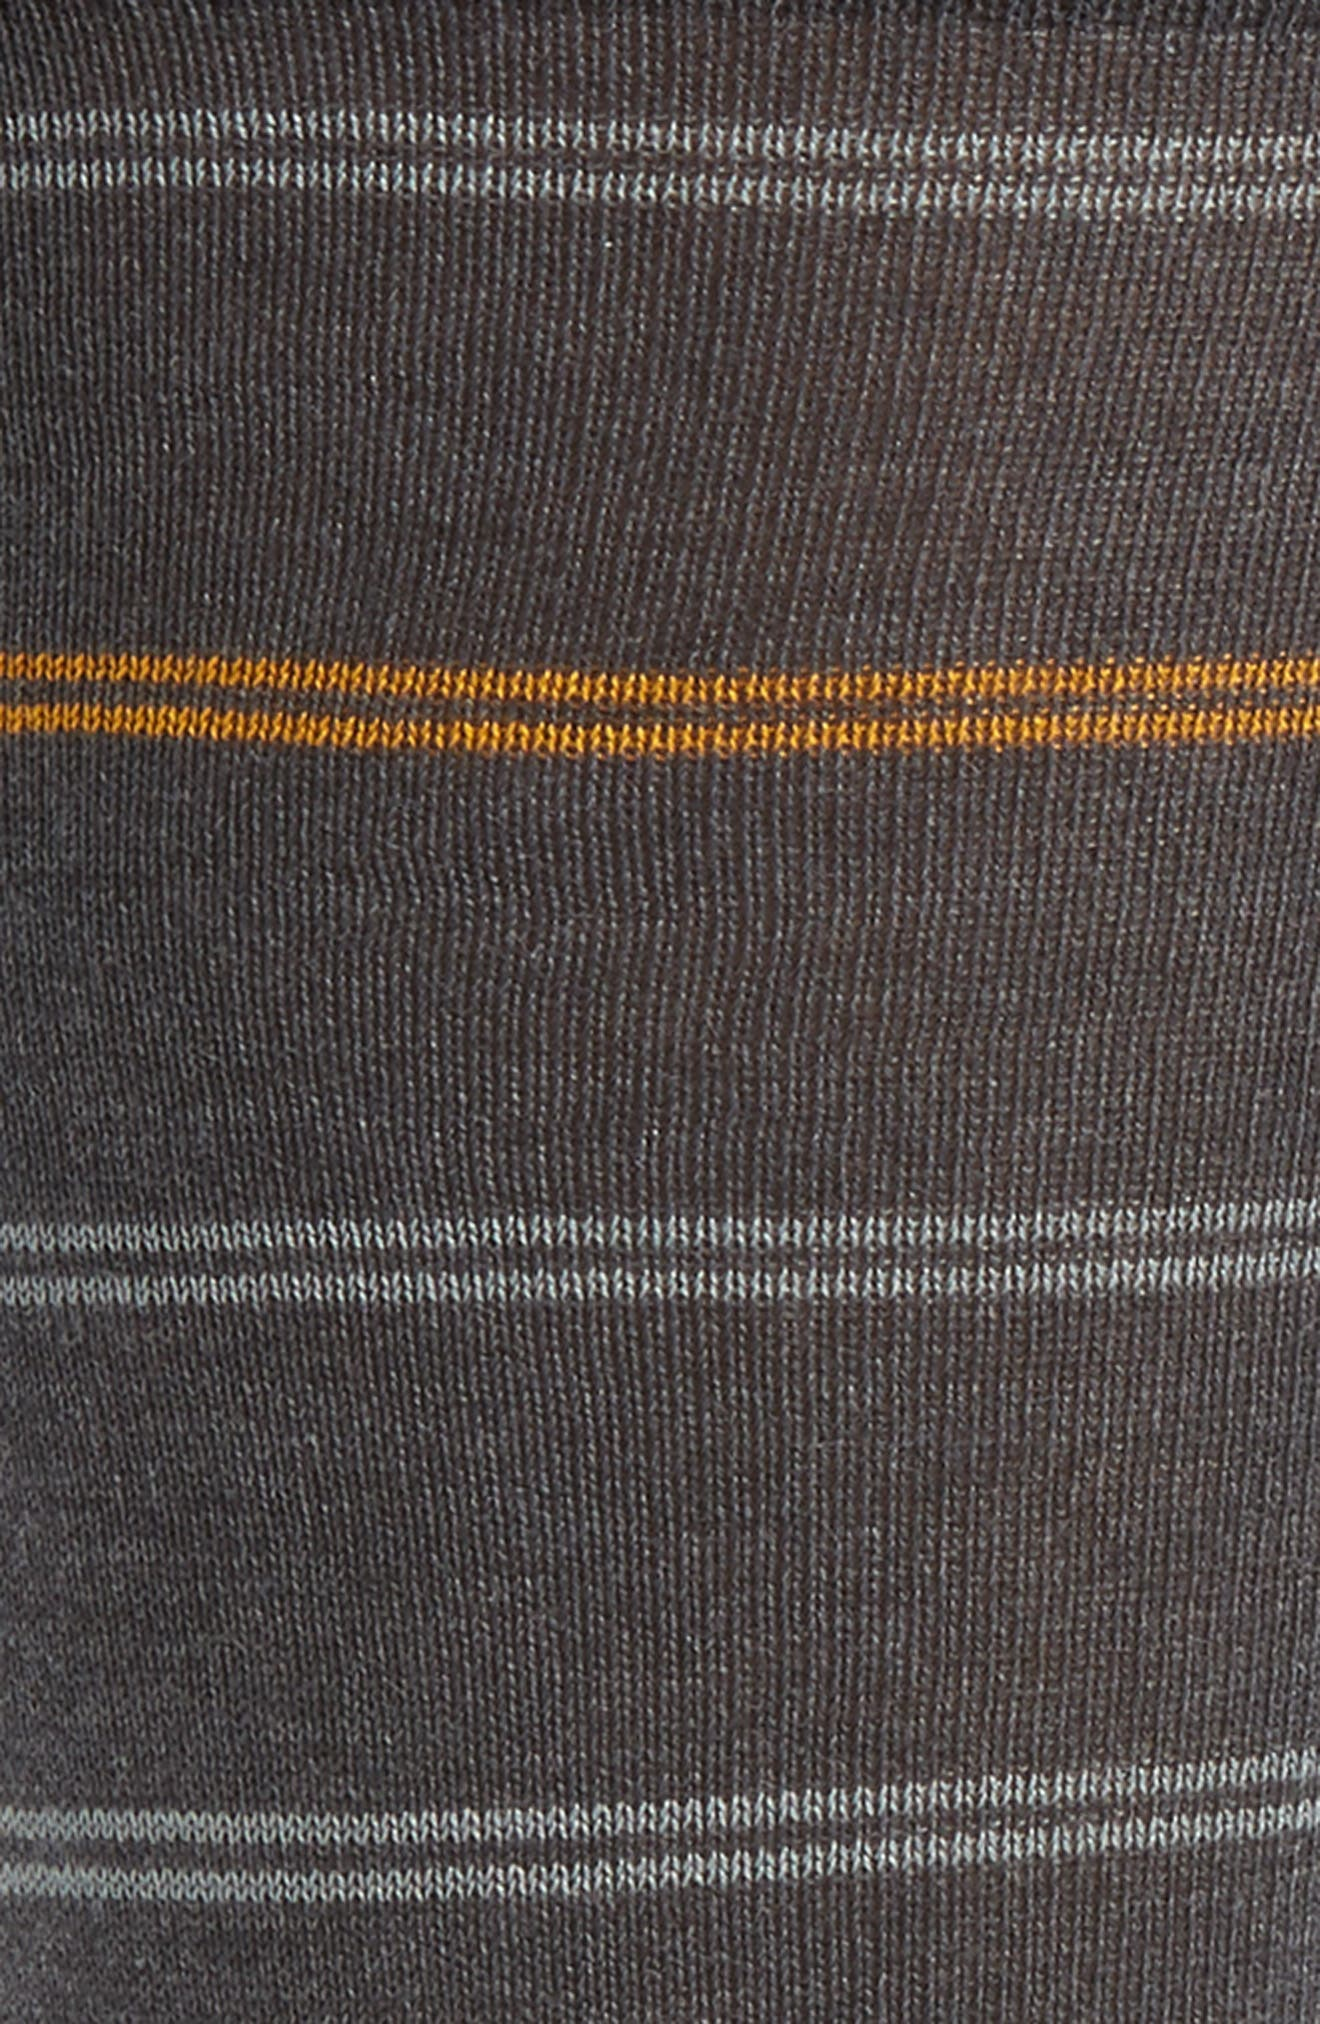 Stripe Socks,                             Alternate thumbnail 2, color,                             Charcoal/ Grey